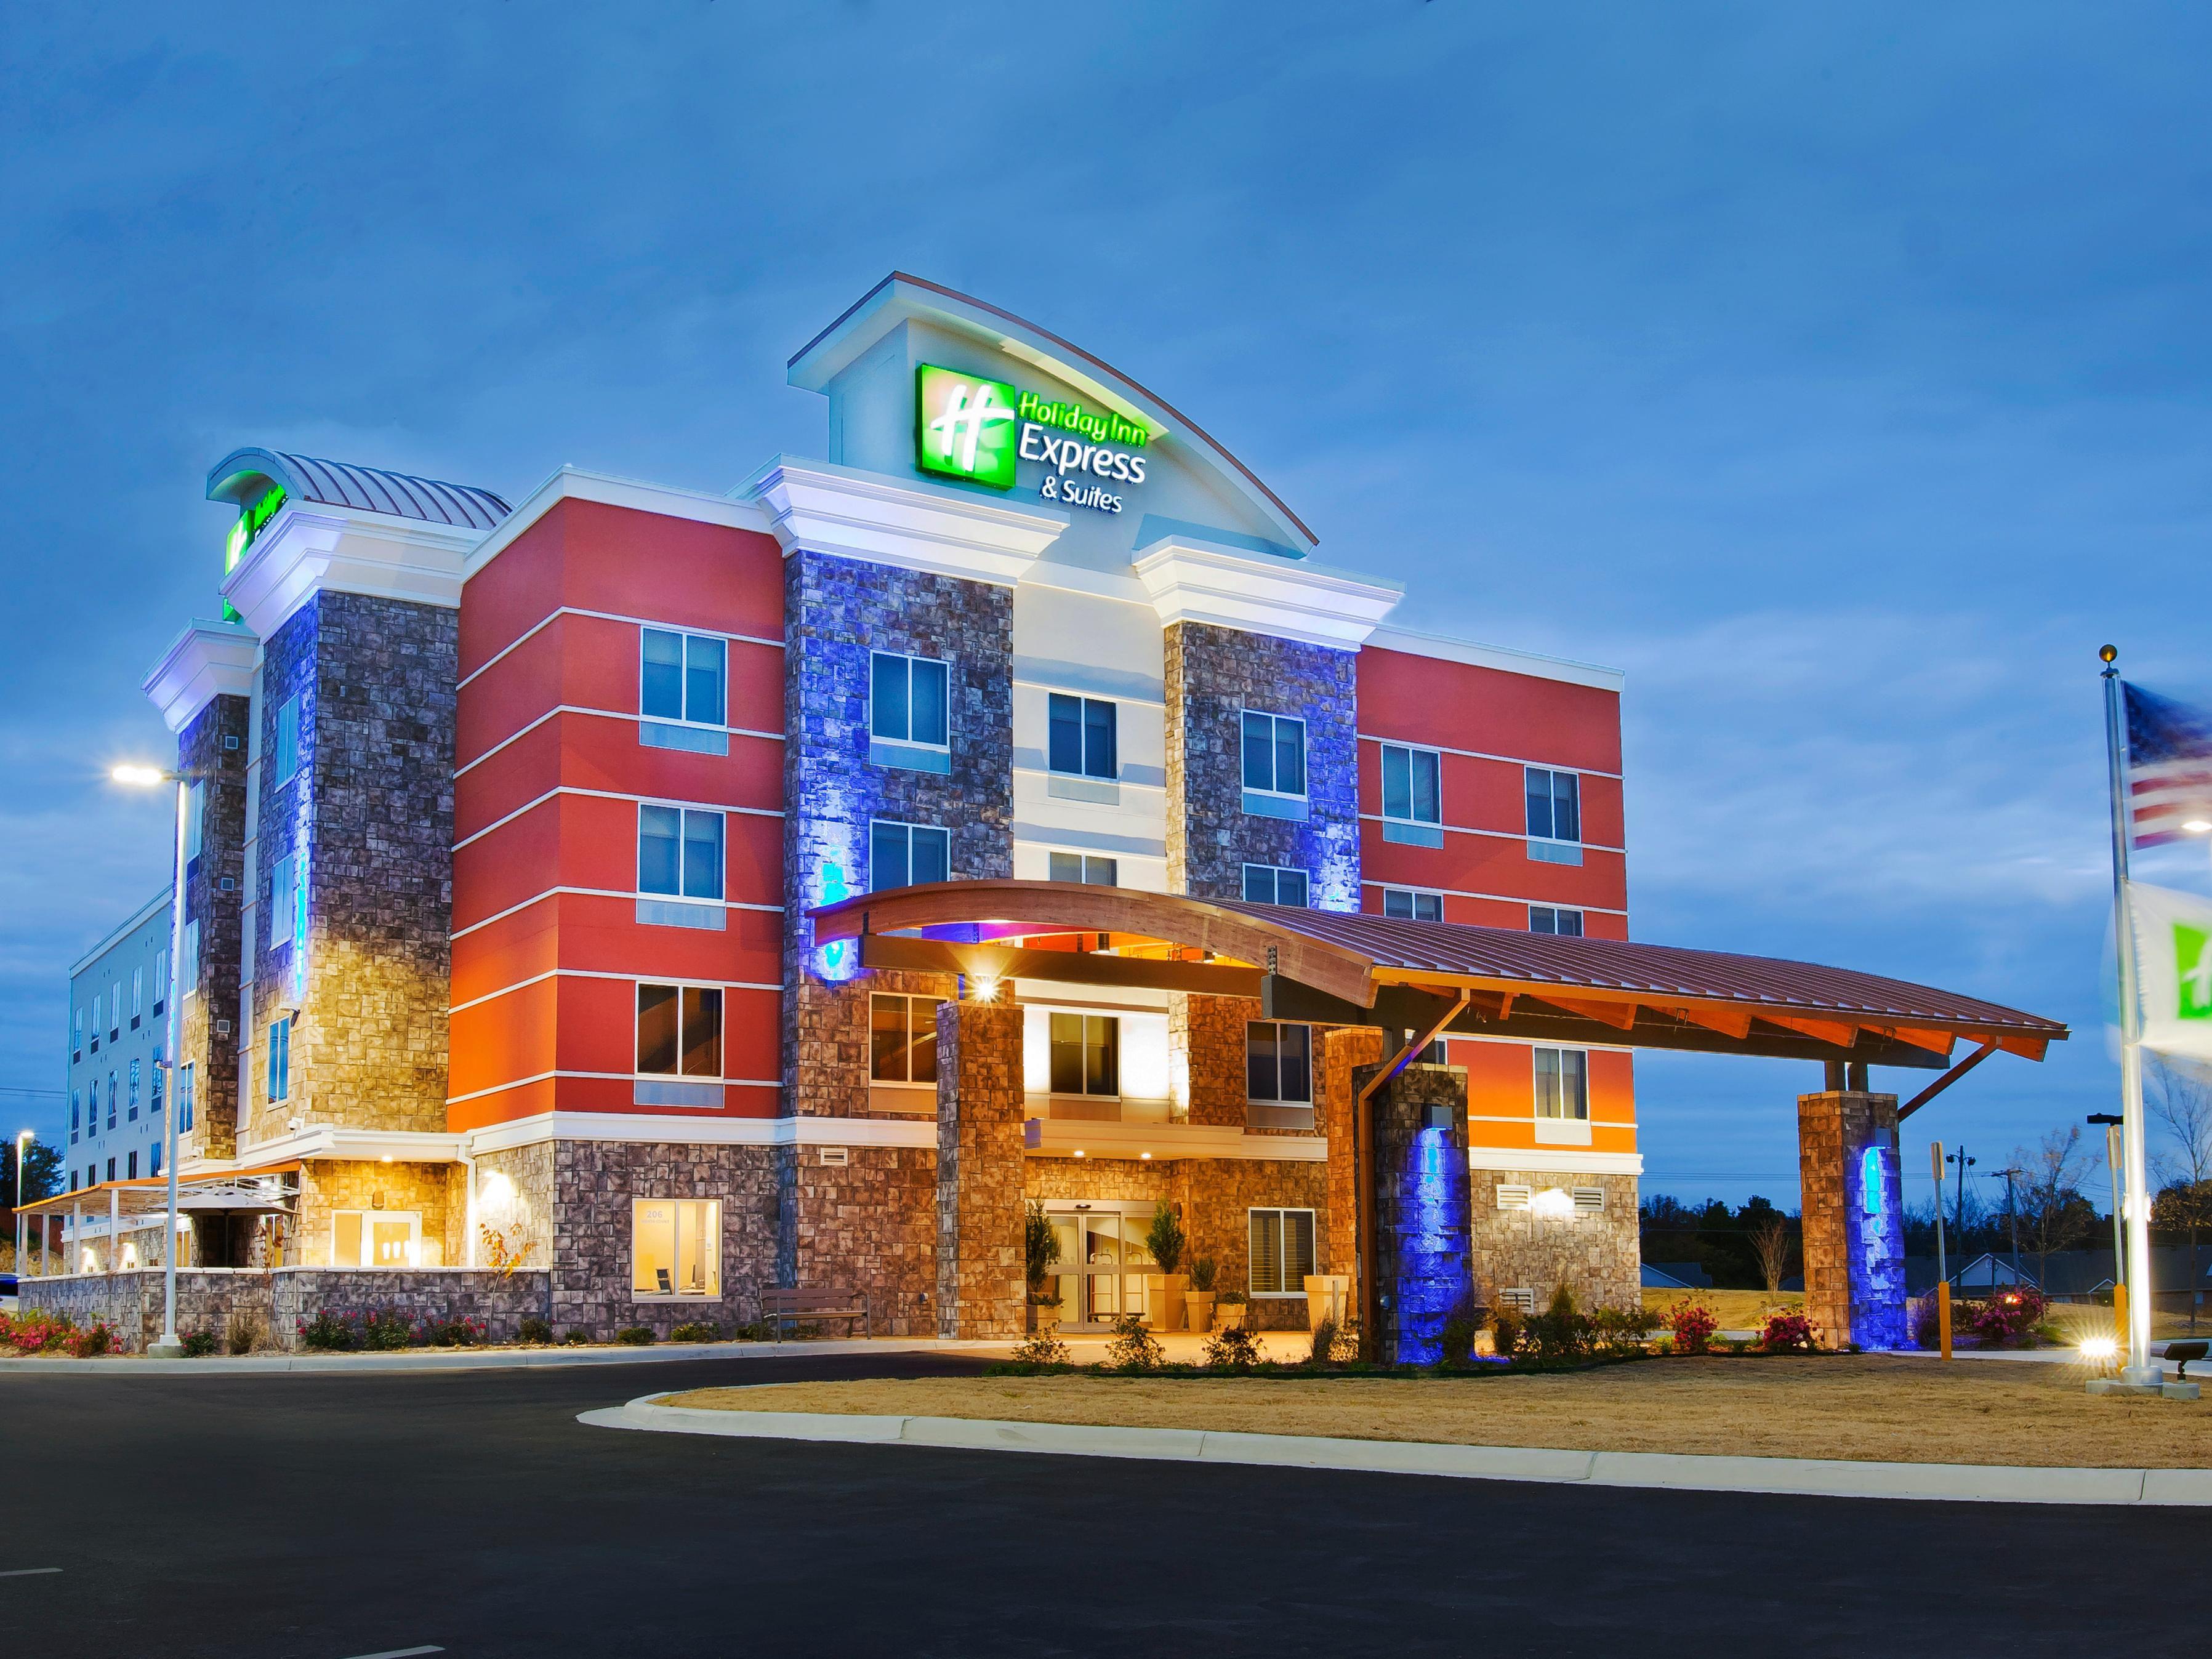 Hotels Near Hot Springs Ar